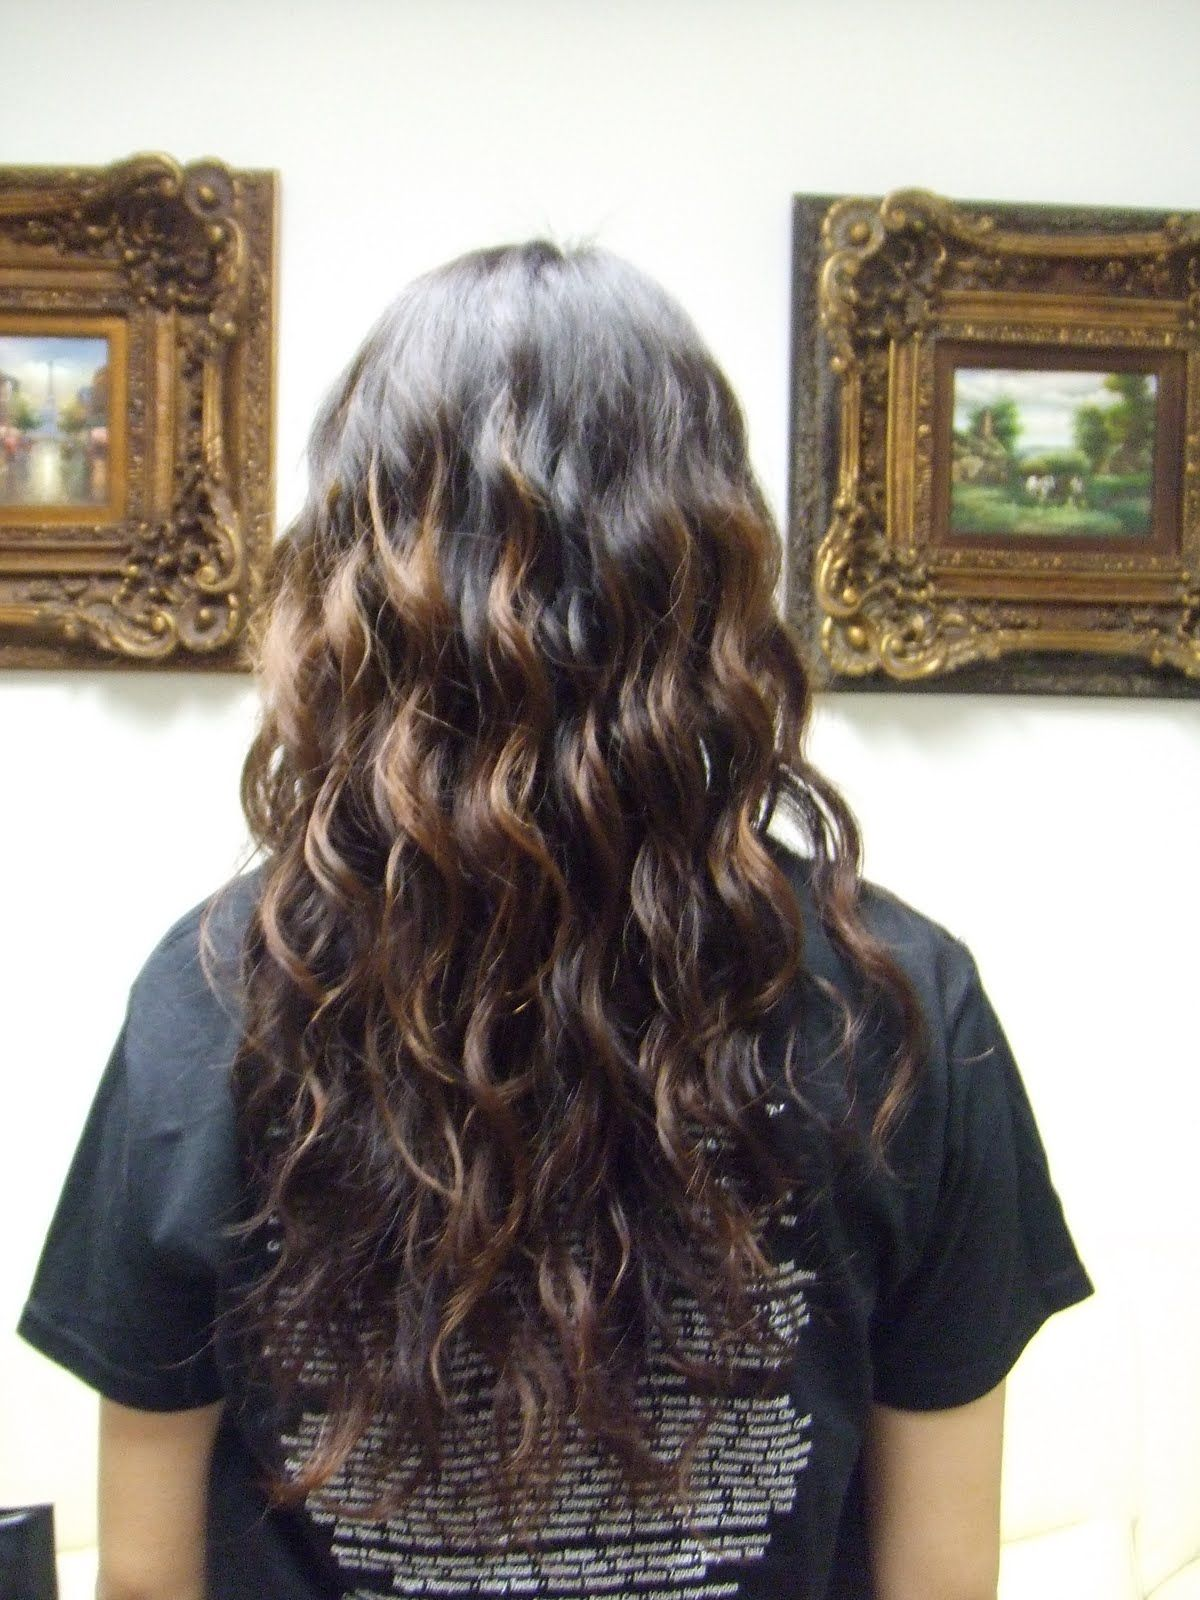 Love This Beach Waves Hair Look Check Out Our Easy Tutorial Here On Http Dropdeadgorgeousdaily Com 2014 11 Quickest Beach Wa Long Hair Perm Hair Styles Hair